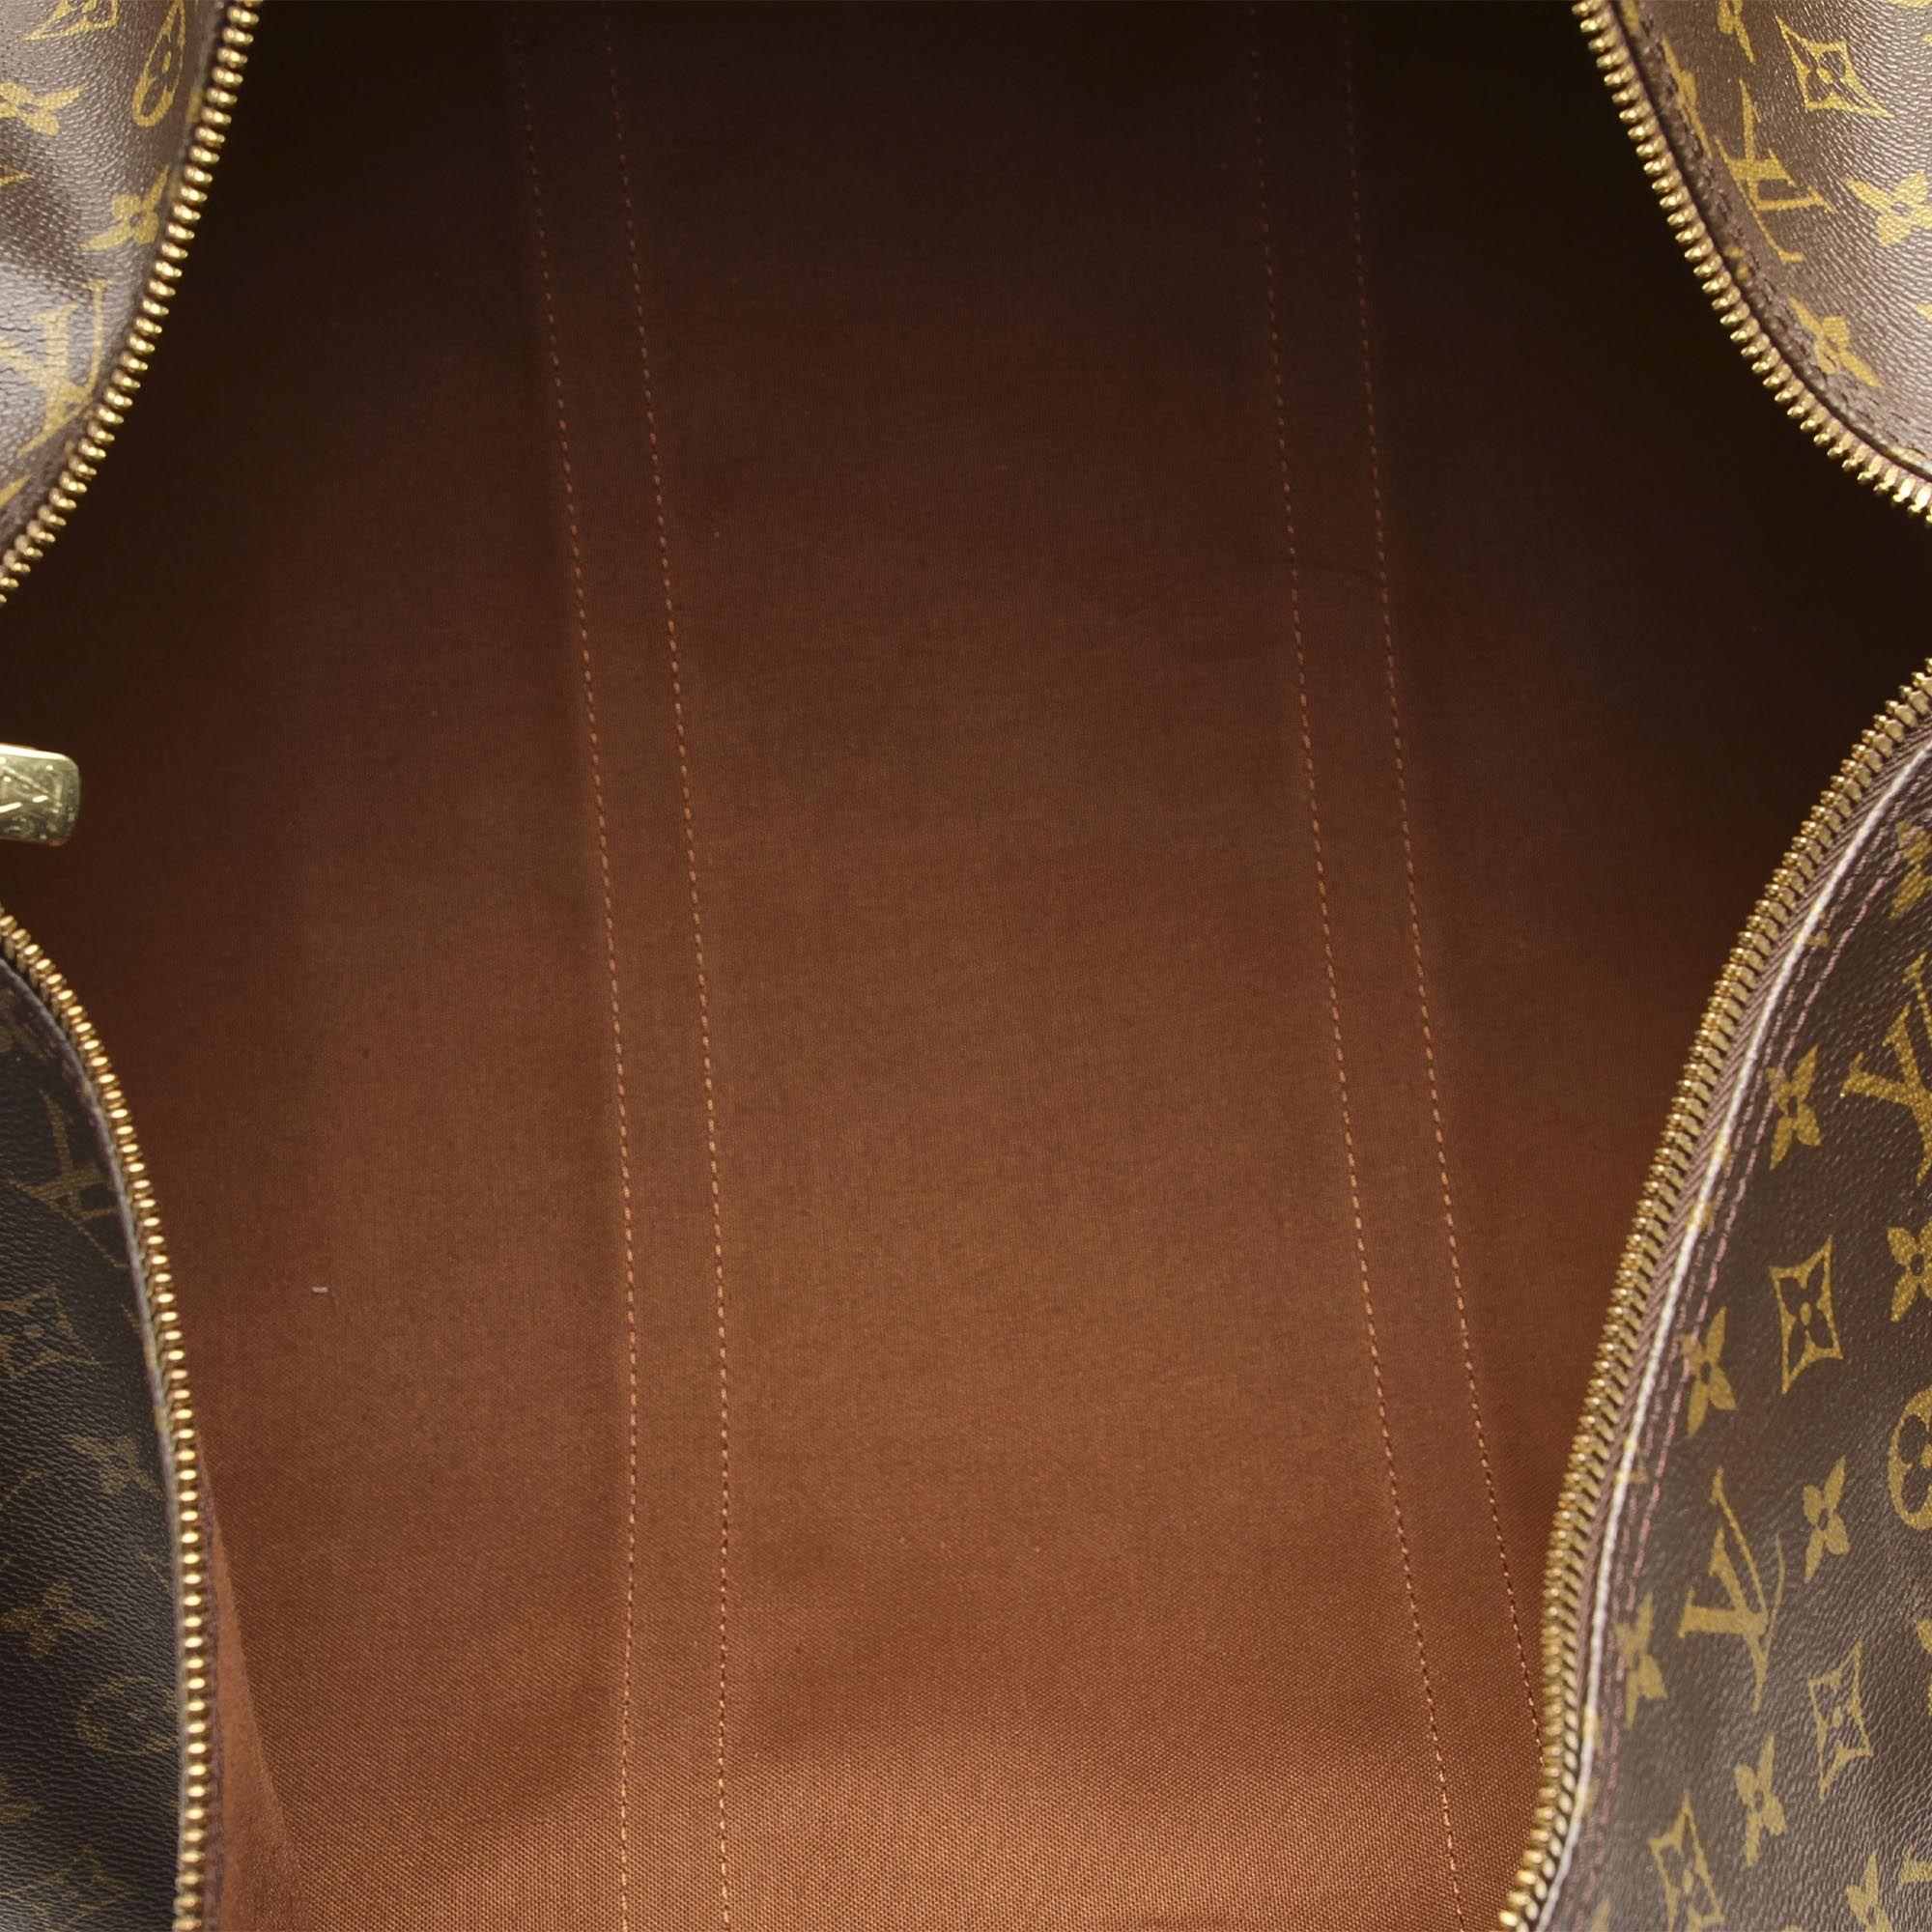 Vintage Louis Vuitton Monogram Keepall 60 Brown